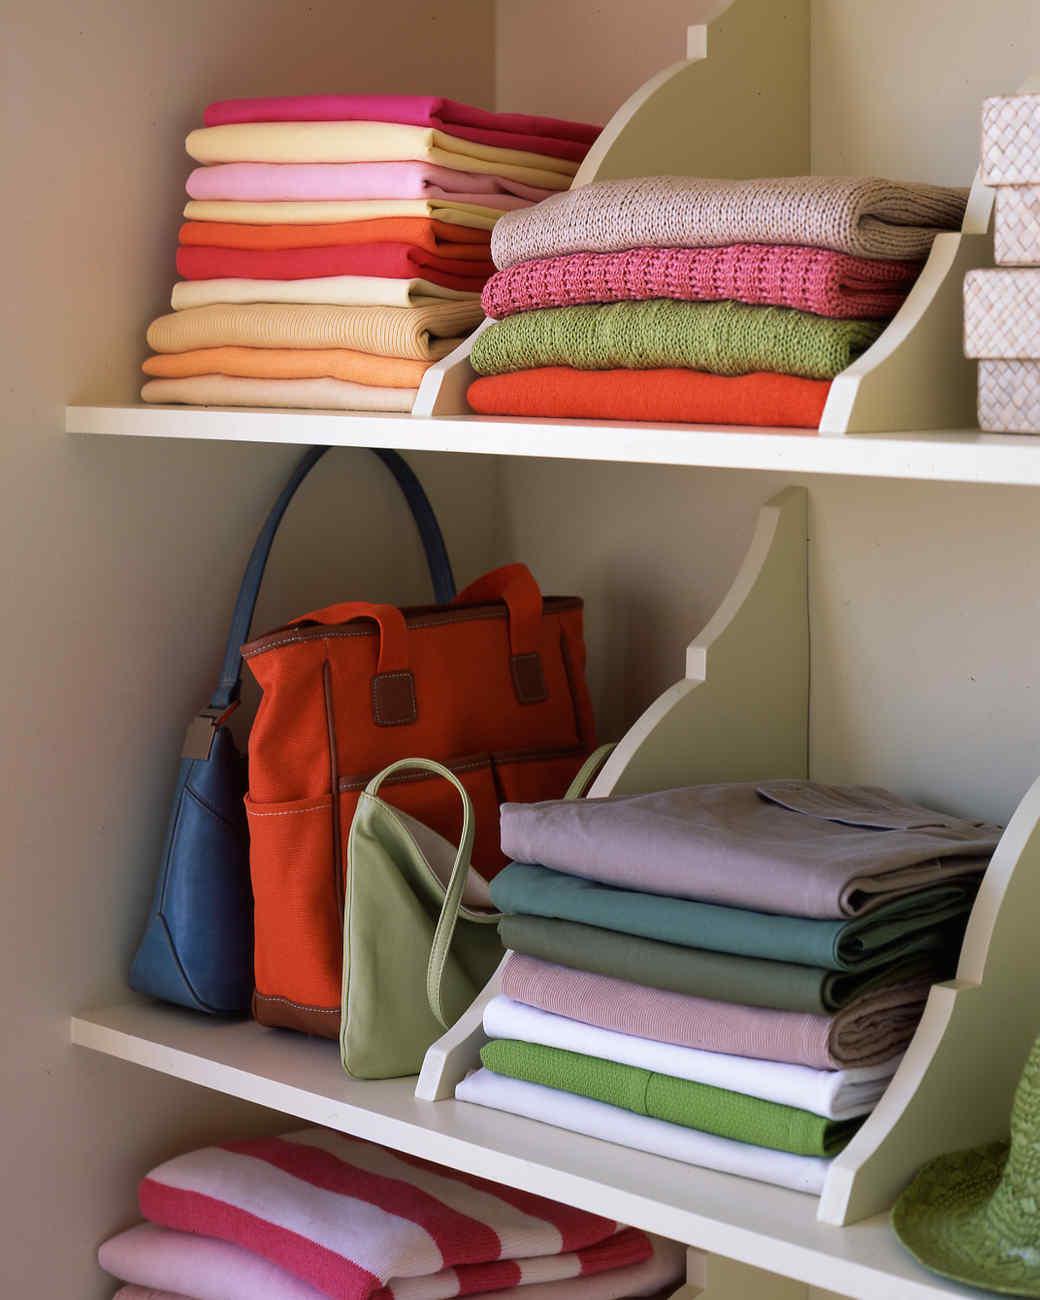 entryway u0026 mudroom inspiration u0026 ideas coat closets diy built ins benches shelves and storage solutions shelf dividers